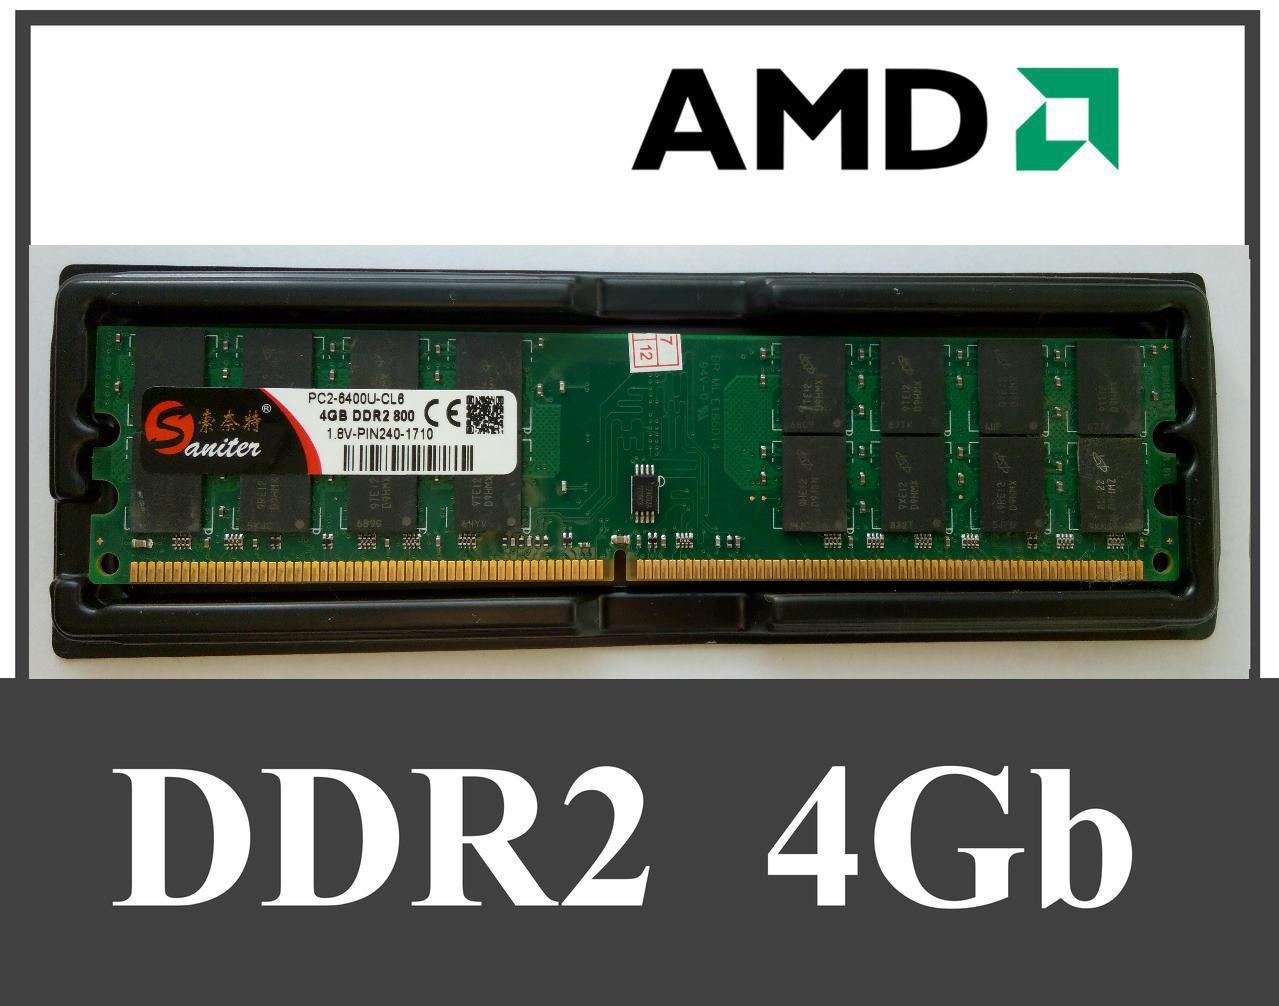 Оперативная память DDR2 4G 800MHz PC2-6400 AMD ОЗУ 4Gb ддр2 4Гб